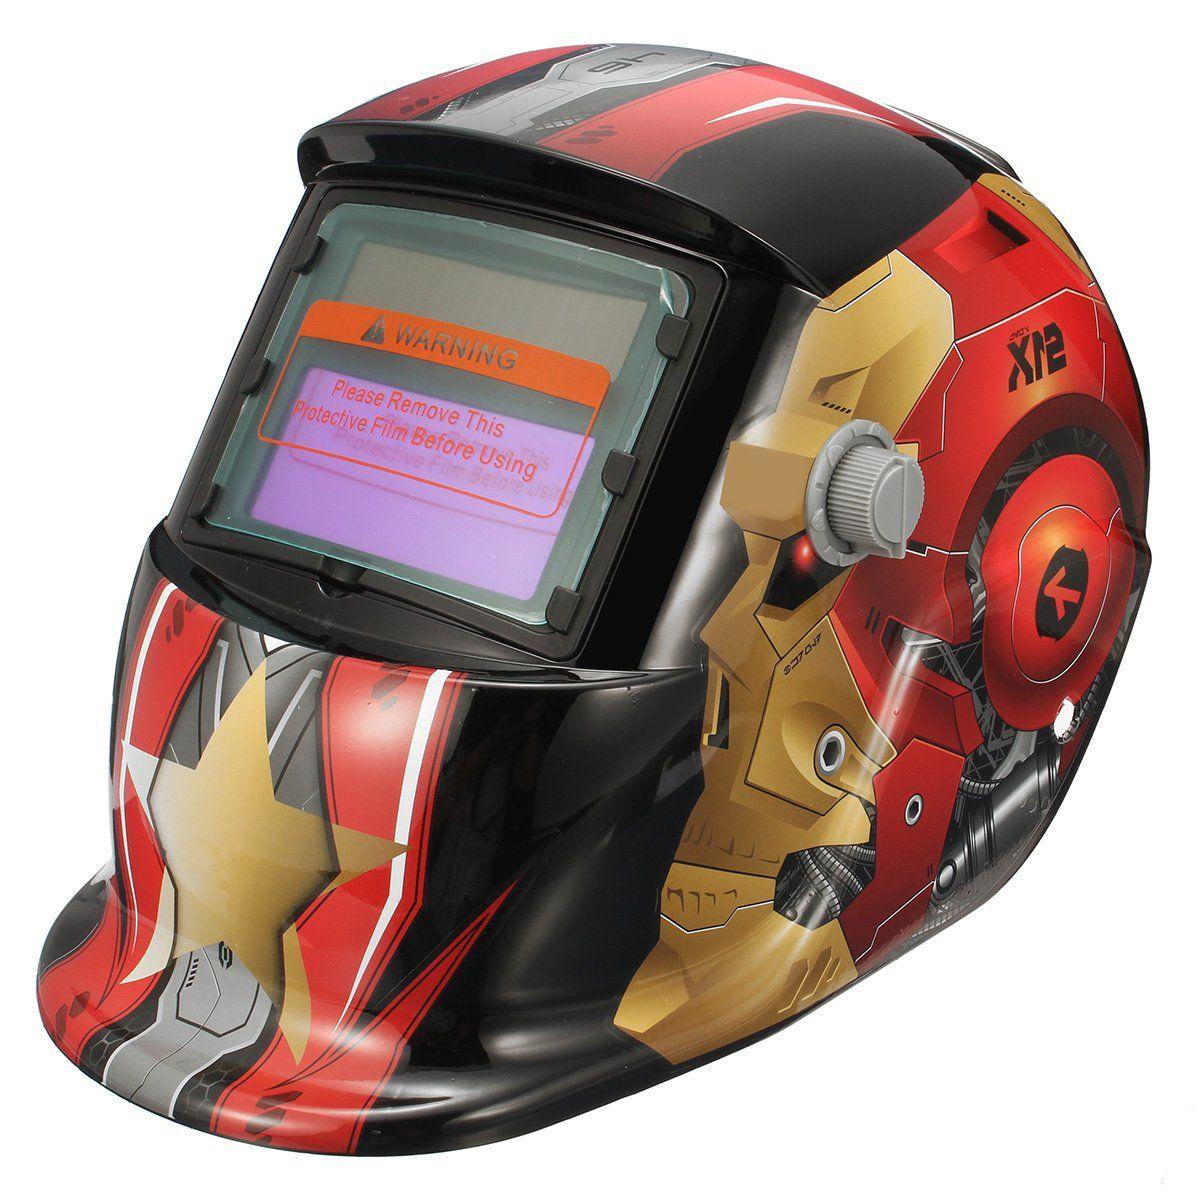 Solar Auto Darkening Welding Mask Helmet Tig Mask Grinding